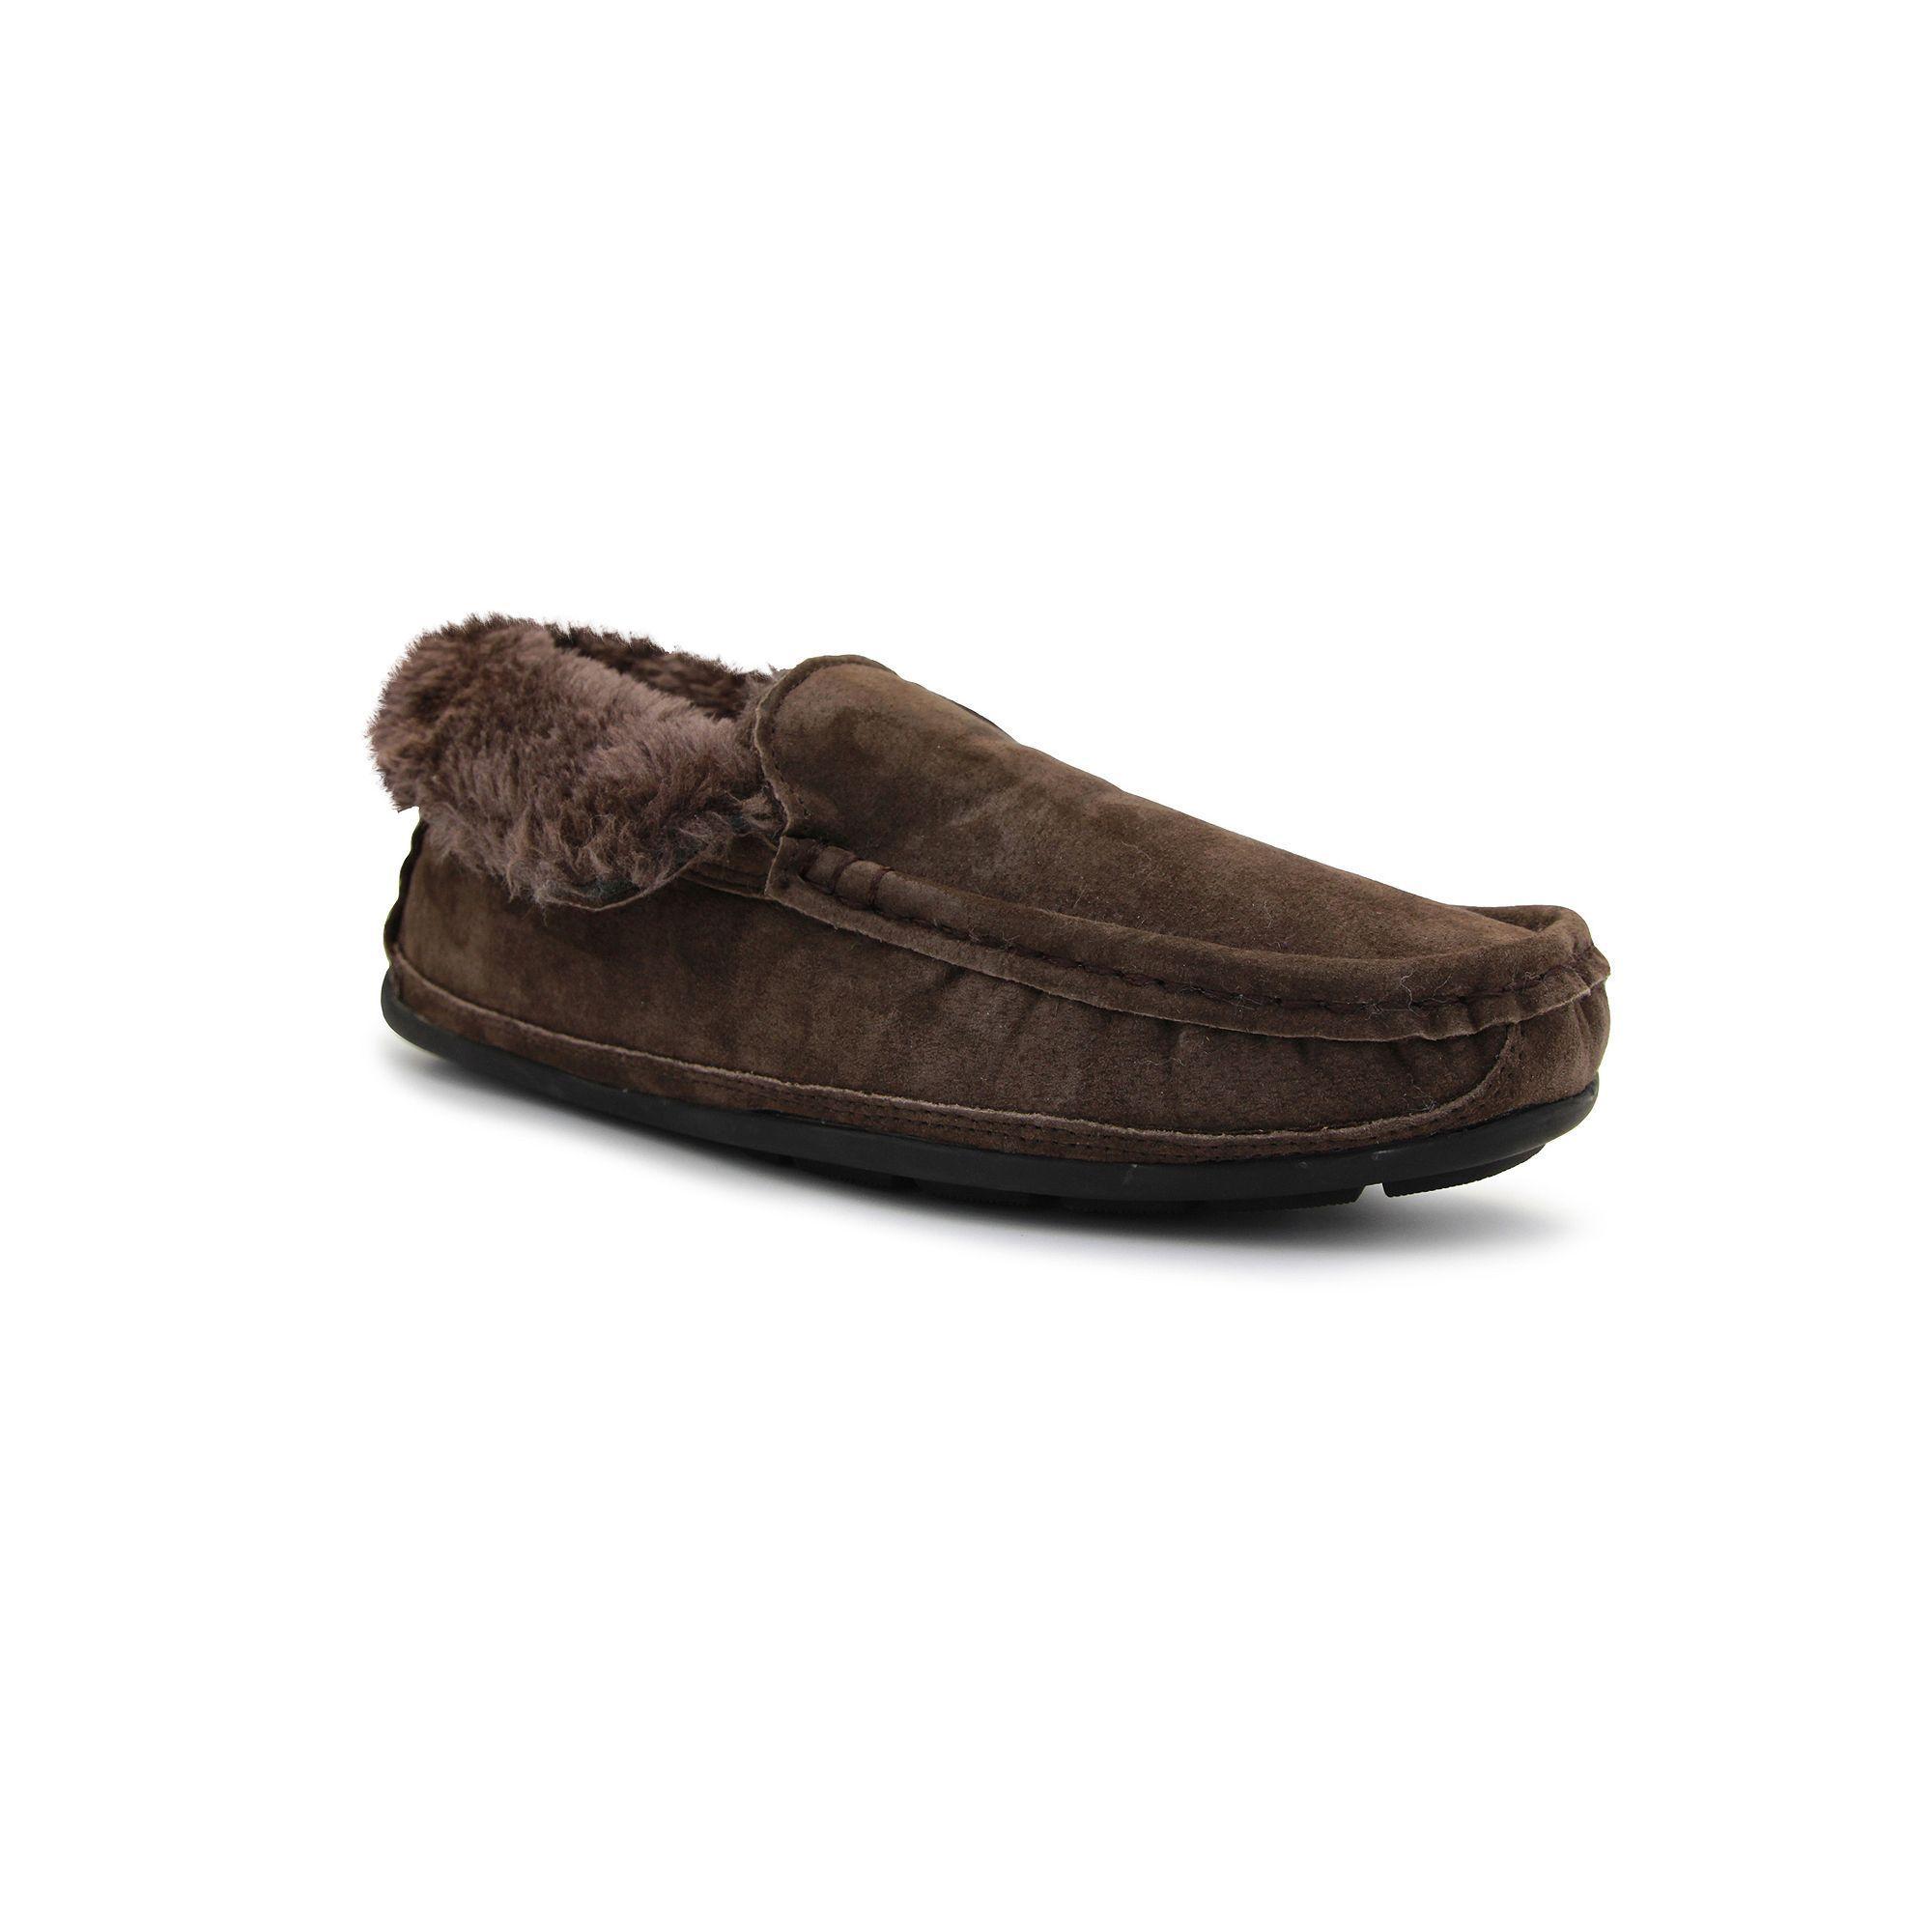 71a7c0efbd5e LAMO Tremont Men s Moccasin Slippers